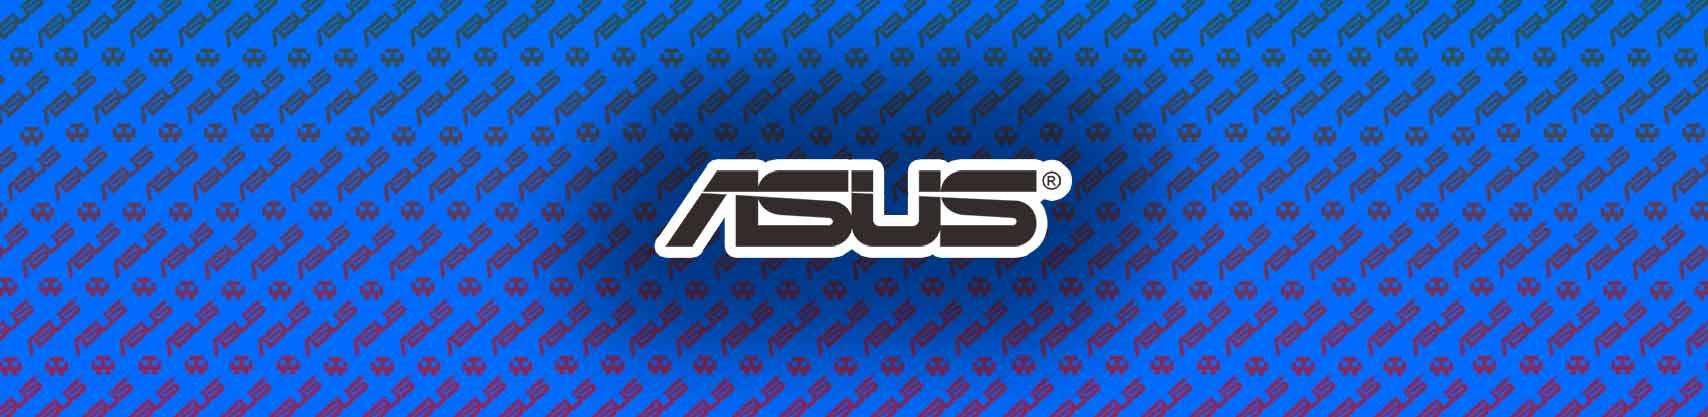 Asus P6X58D-E Manual